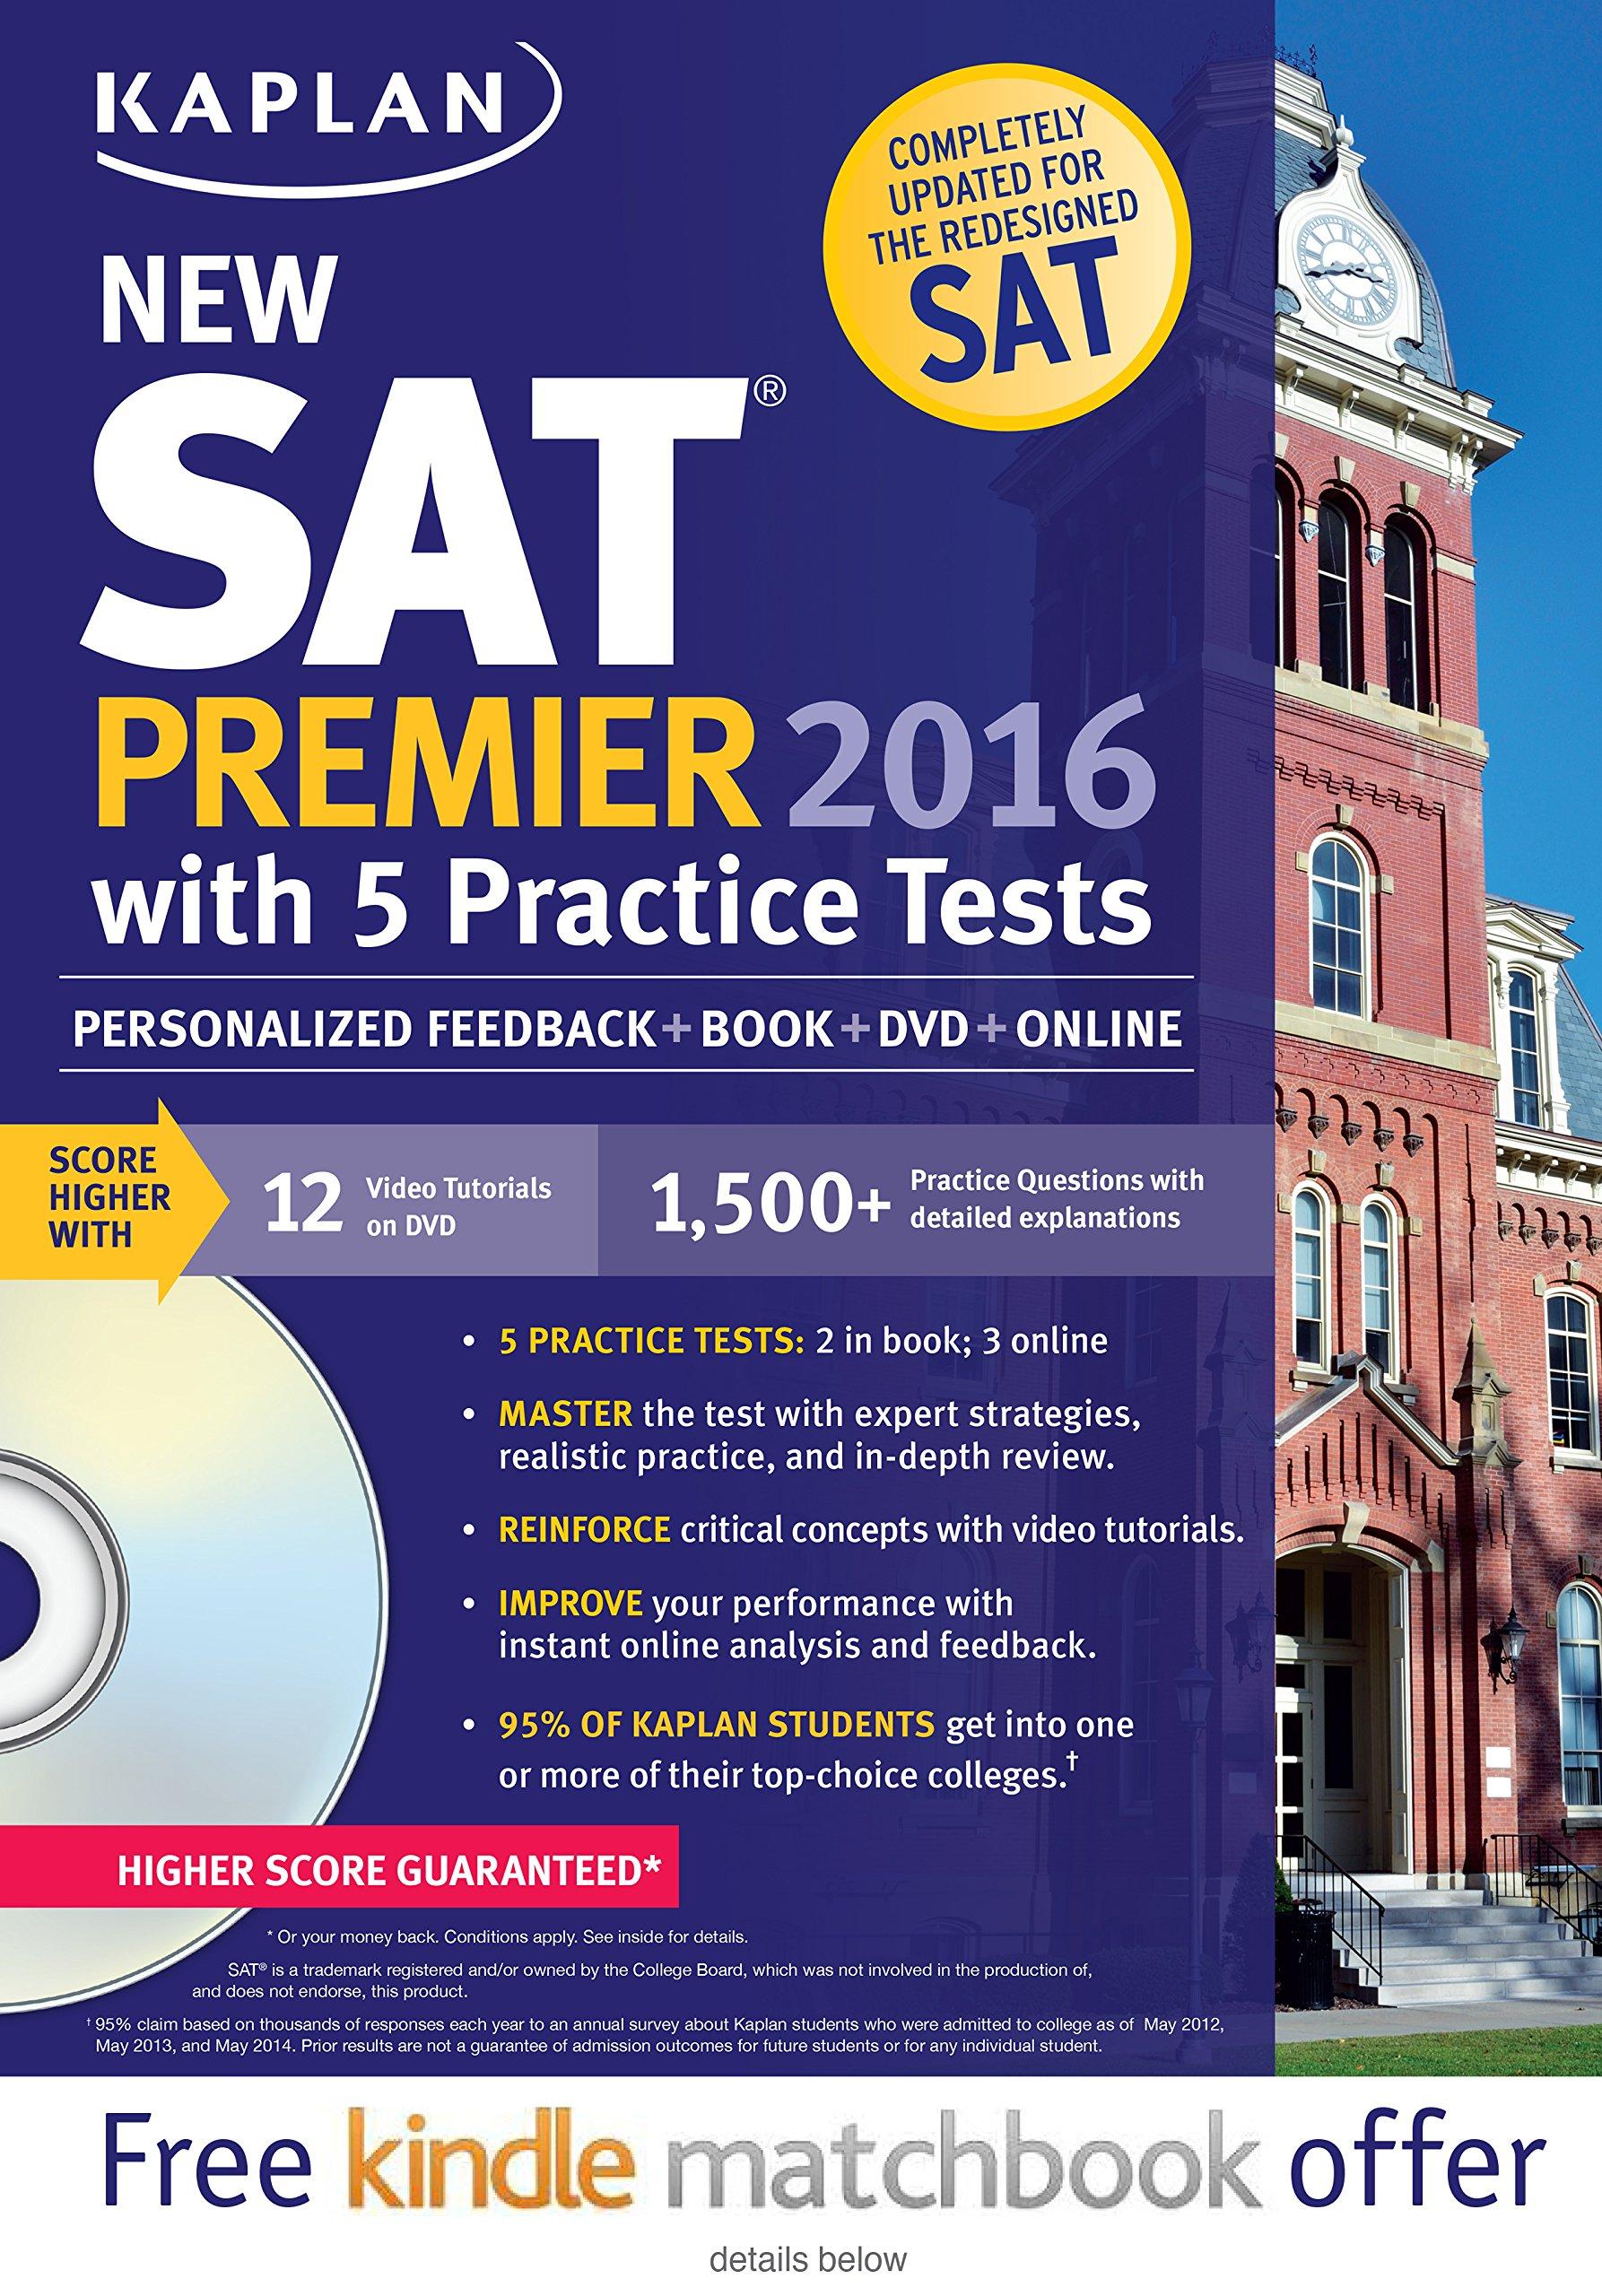 Kaplan New SAT Premier 2016 with 5 Practice Tests: Personalized Feedback +  Book + Online + DVD + Mobile Kaplan Test Prep: Amazon.in: Kaplan: Books